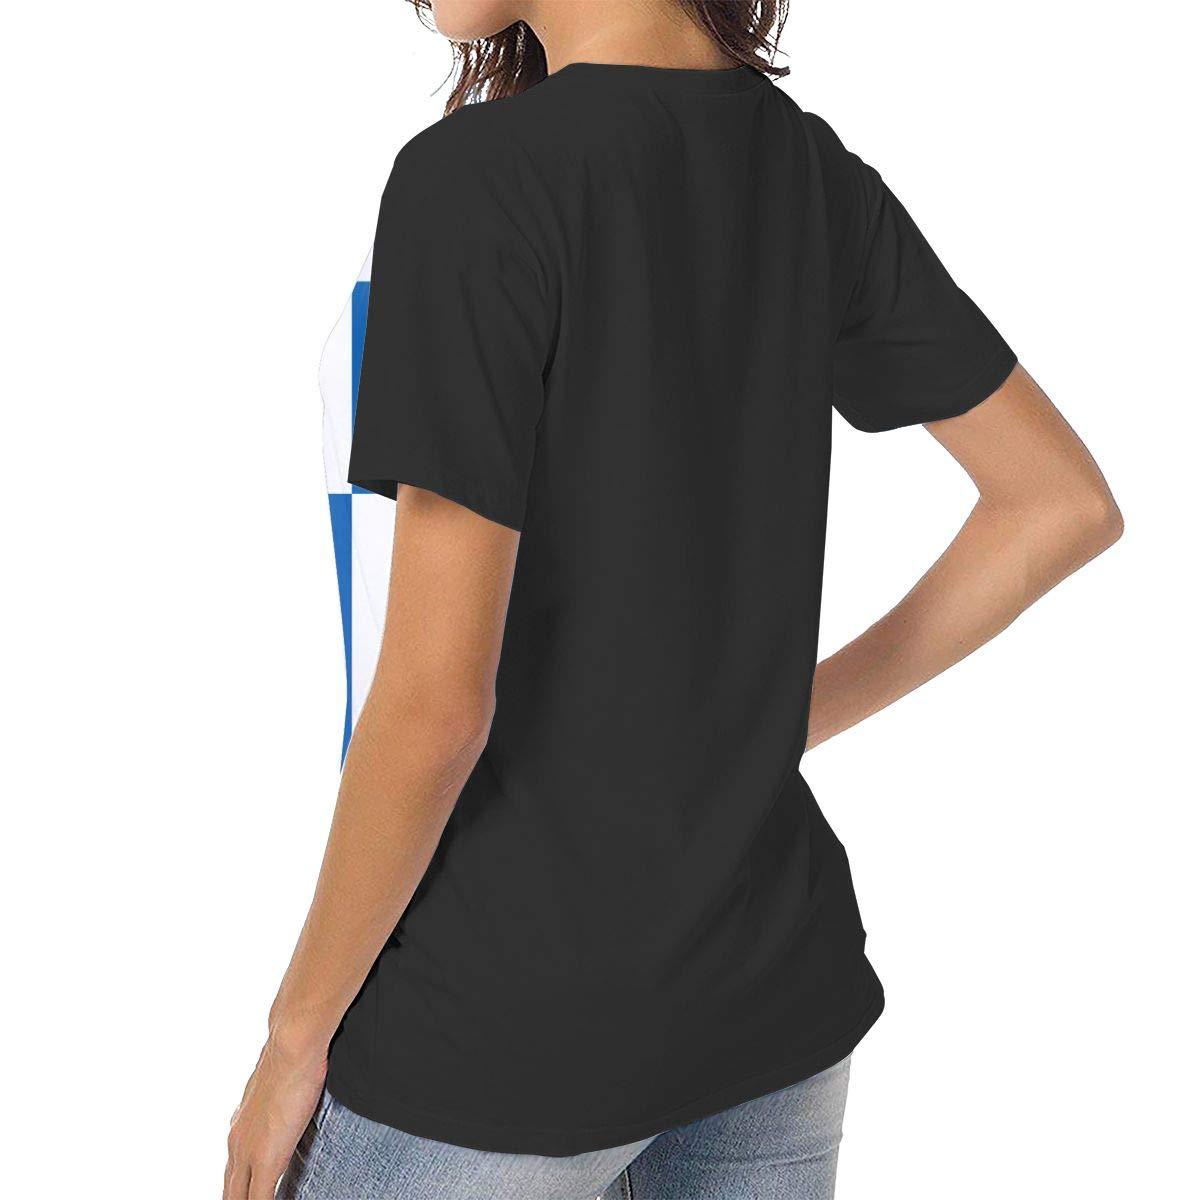 IRON1974 Womens Flag of Greece Short Sleeve T-Shirt Baseball Tees